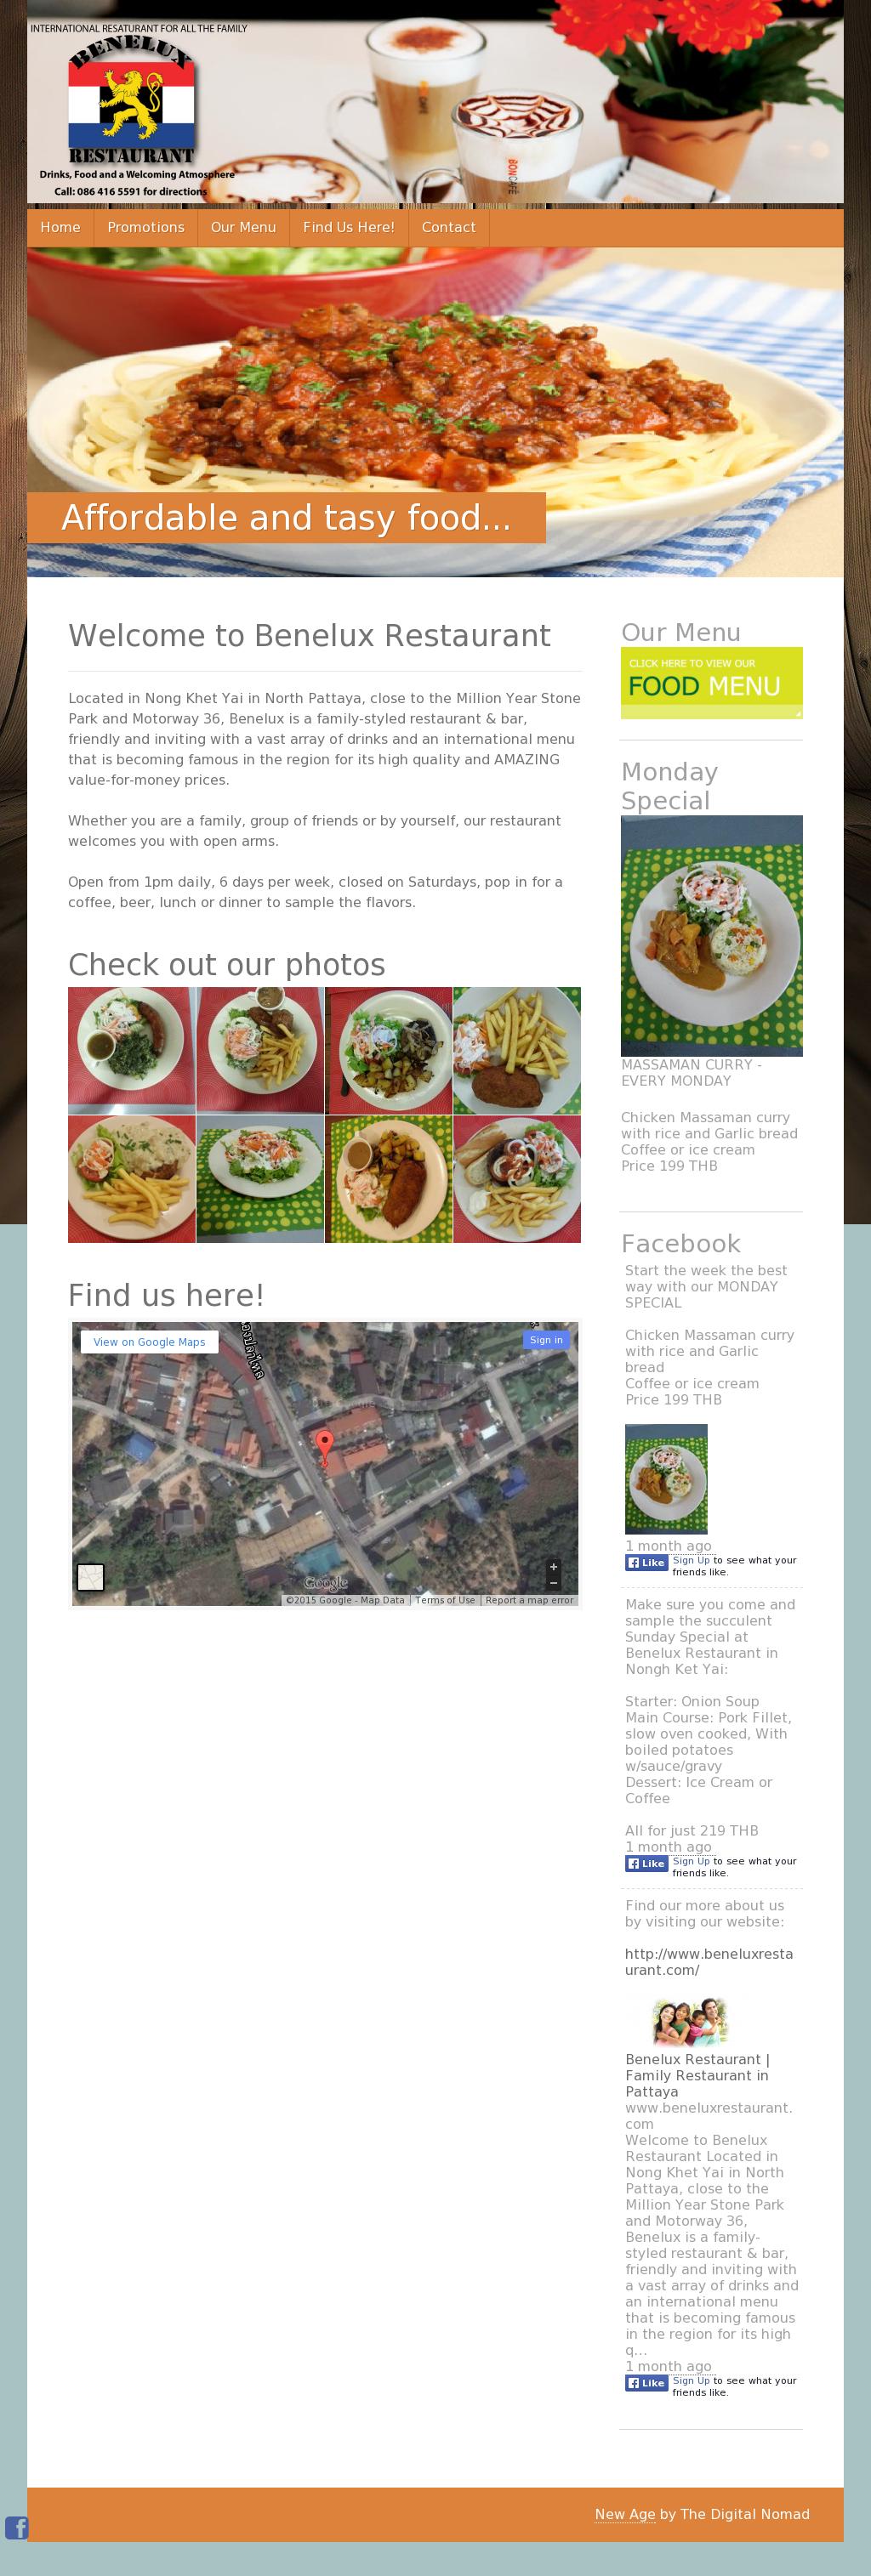 Benelux Restaurant Pattaya Competitors, Revenue and